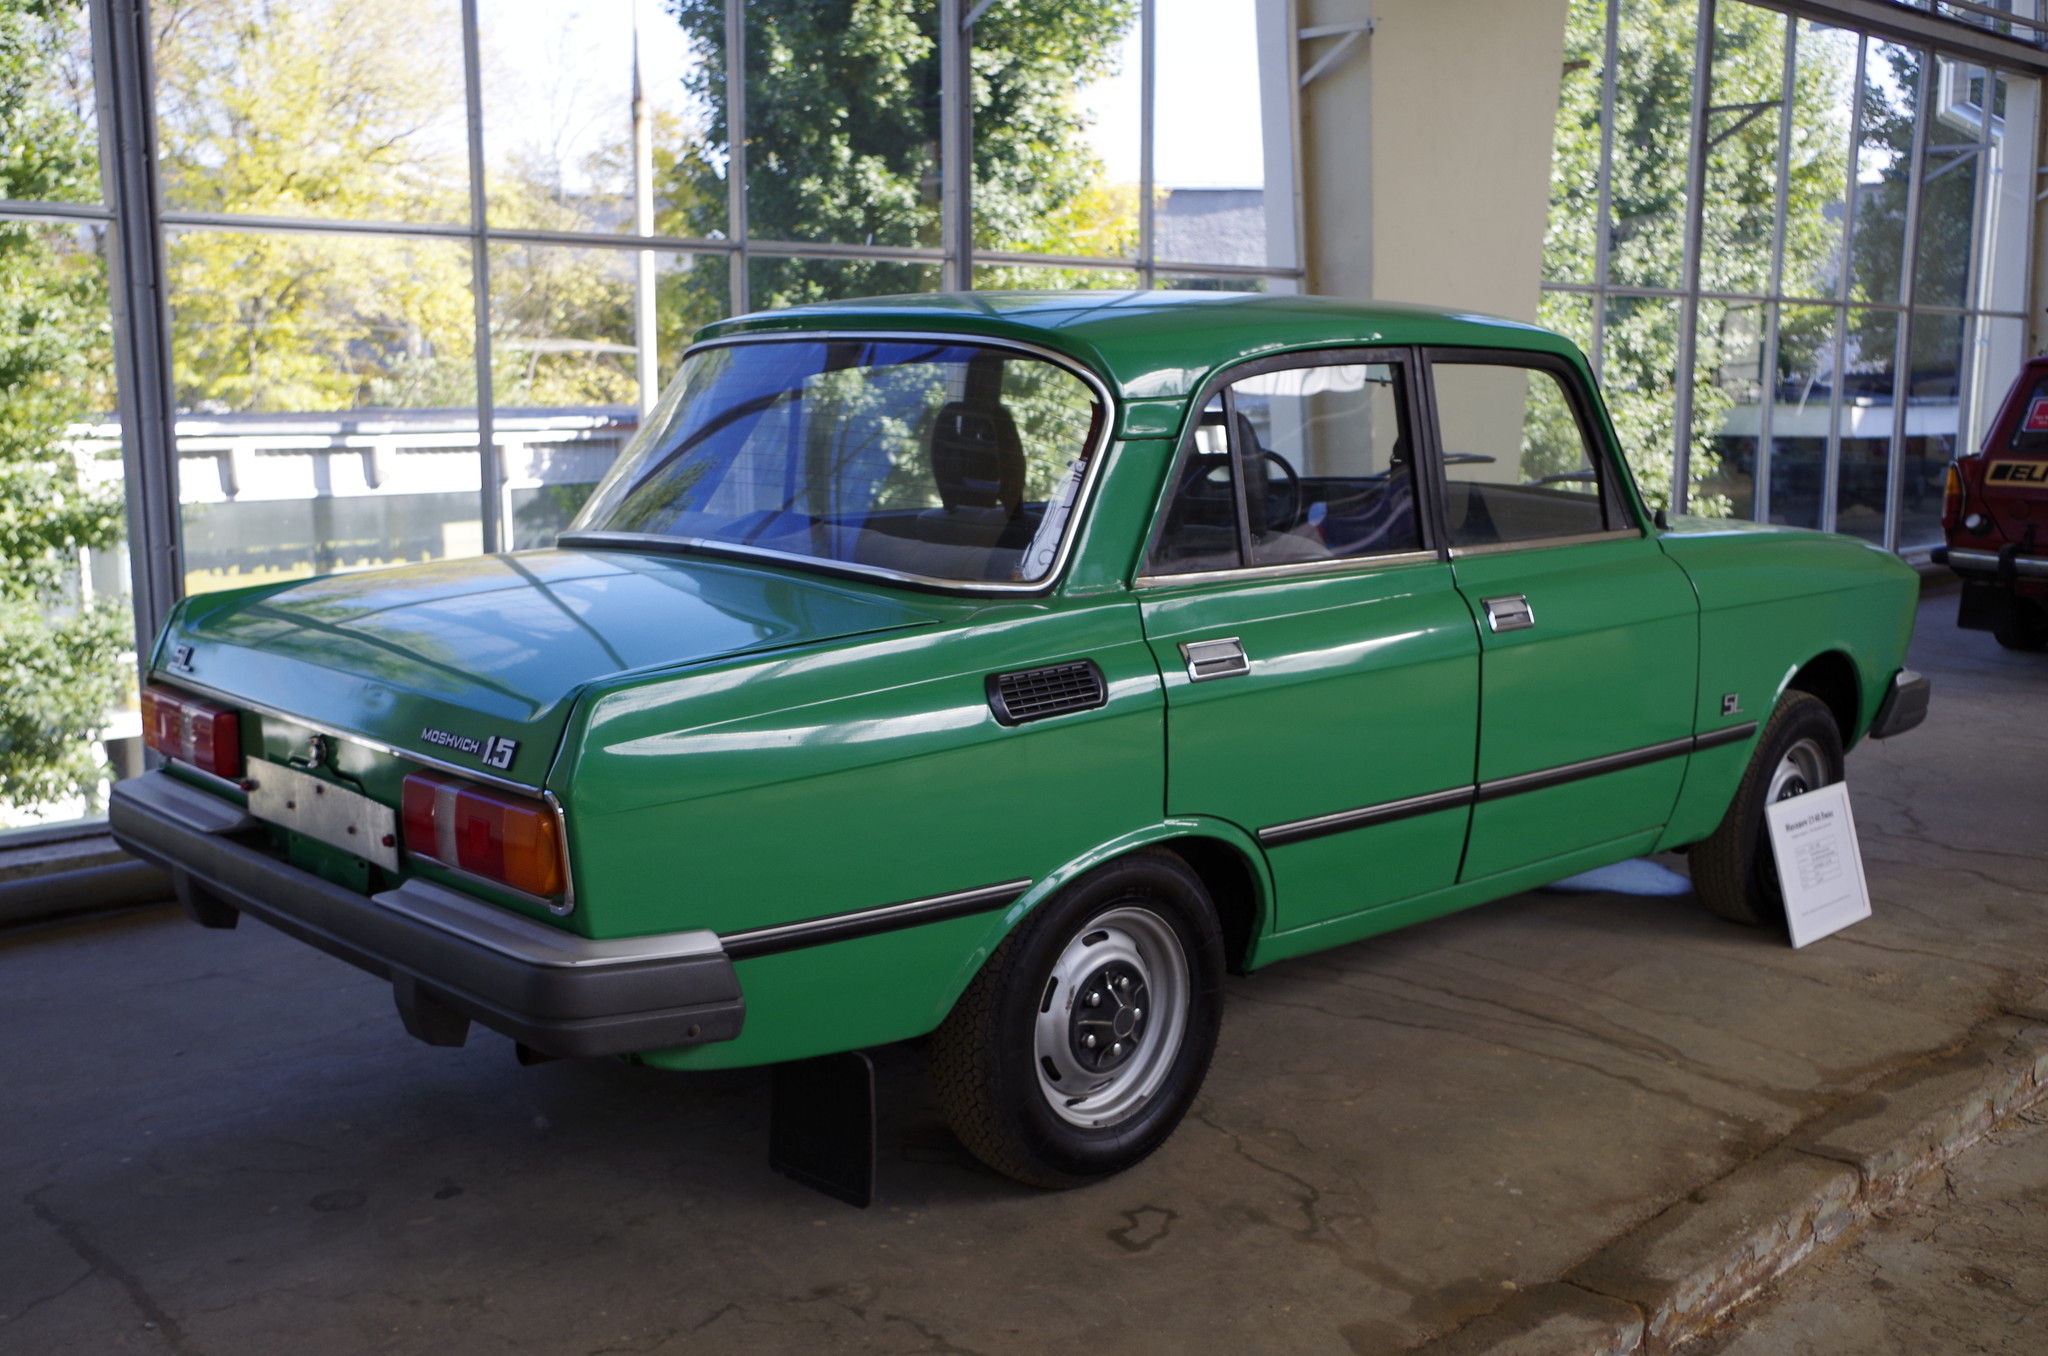 Автомобиль «Москвич-2140 Люкс»